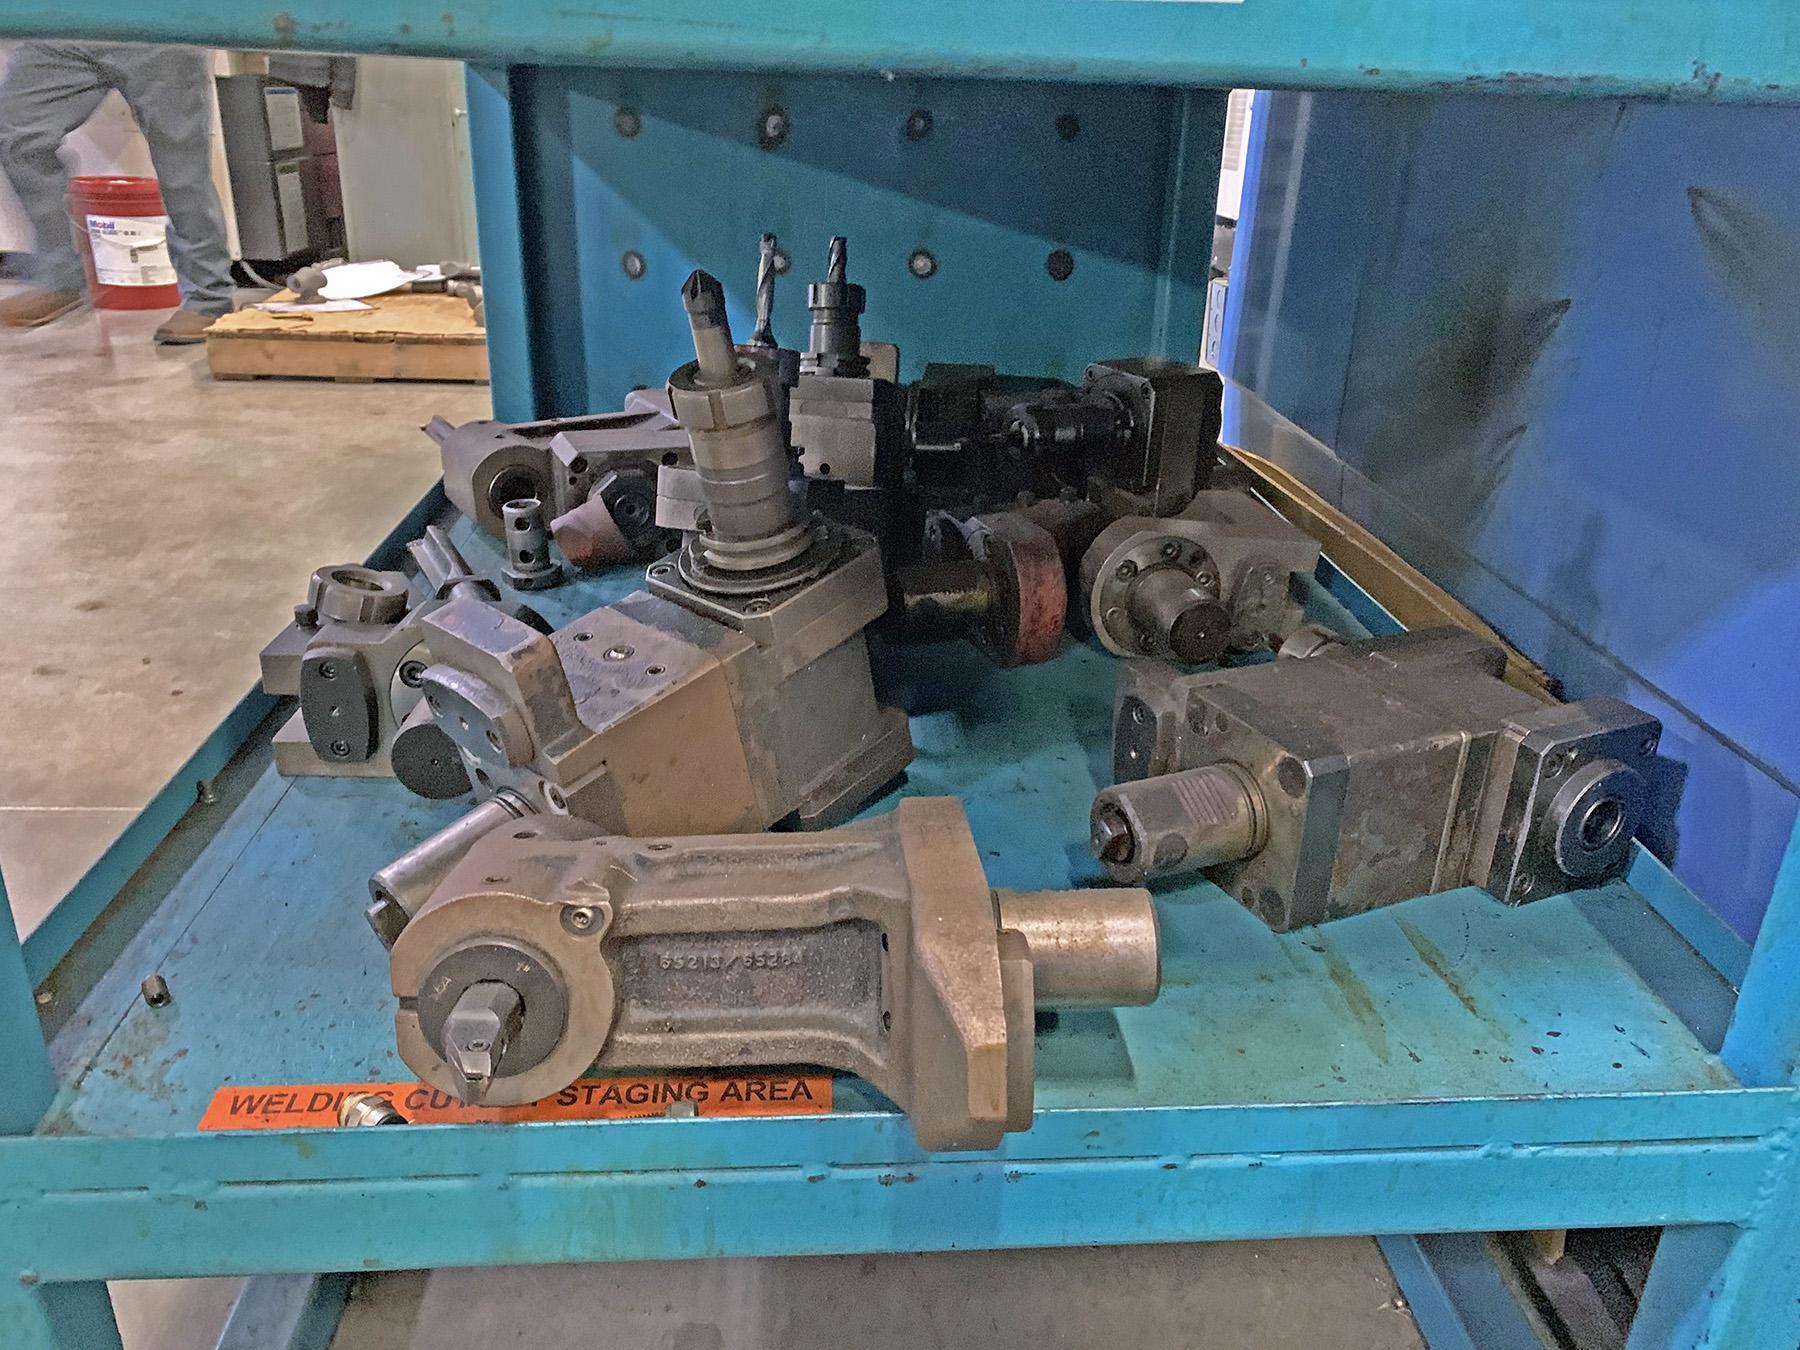 USED, MAZAK MULTIPLEX 630 CNC TURNING AND MILLING CENTER